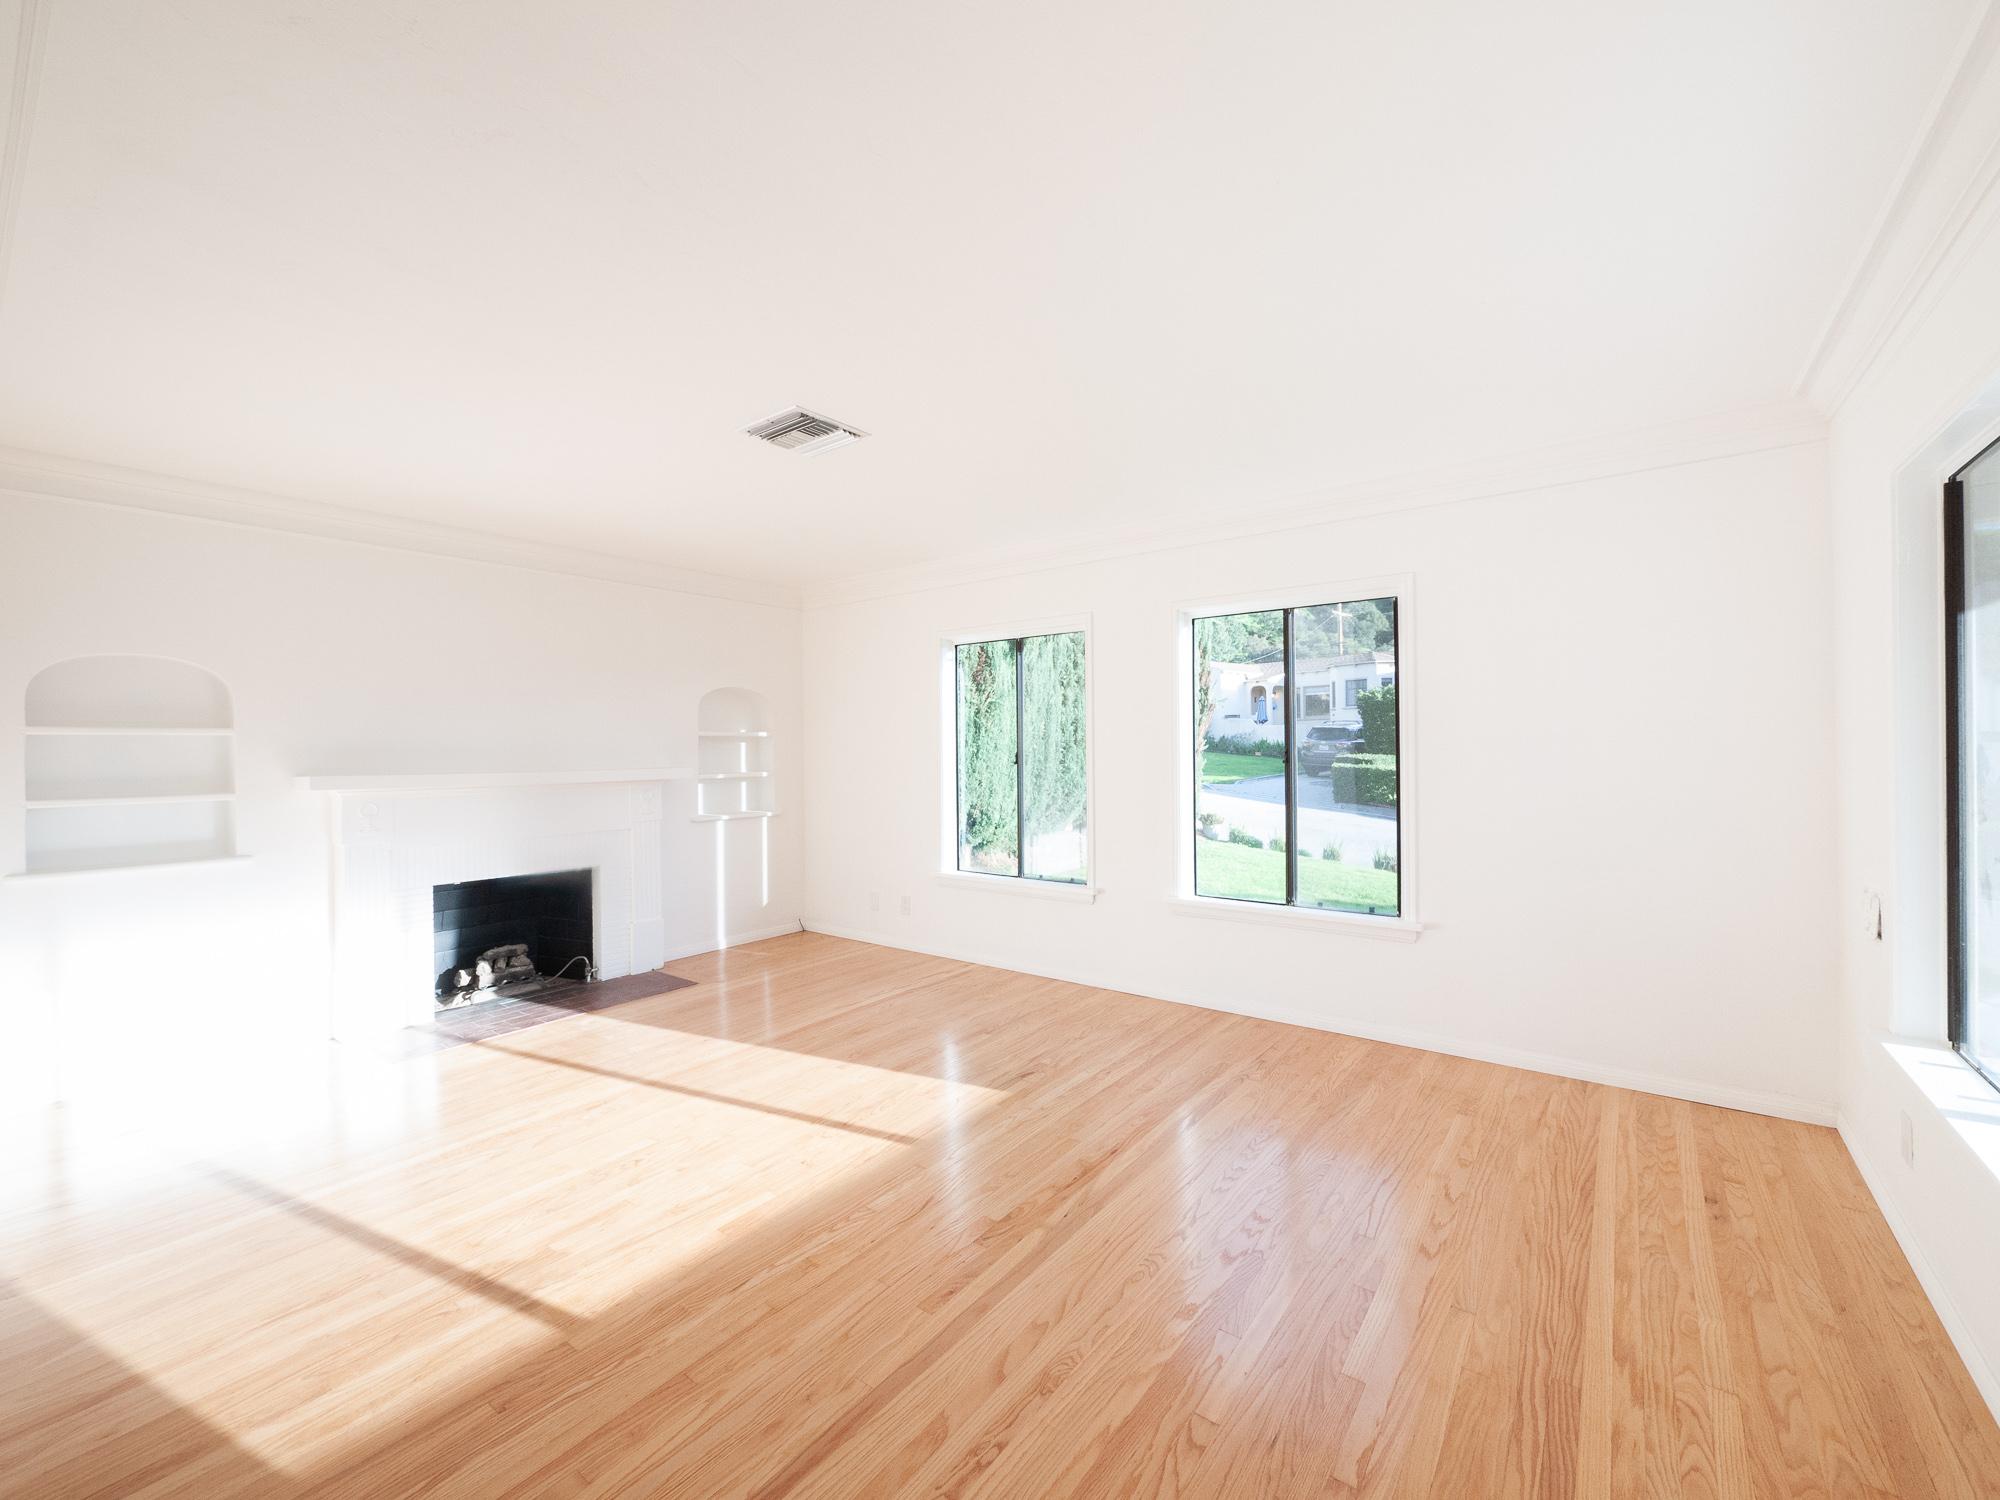 2/1 + detached bonus studio, 0/1, storage and garage! Charming stunner on a large corner lot, greenery, sunshine, gorgeous!